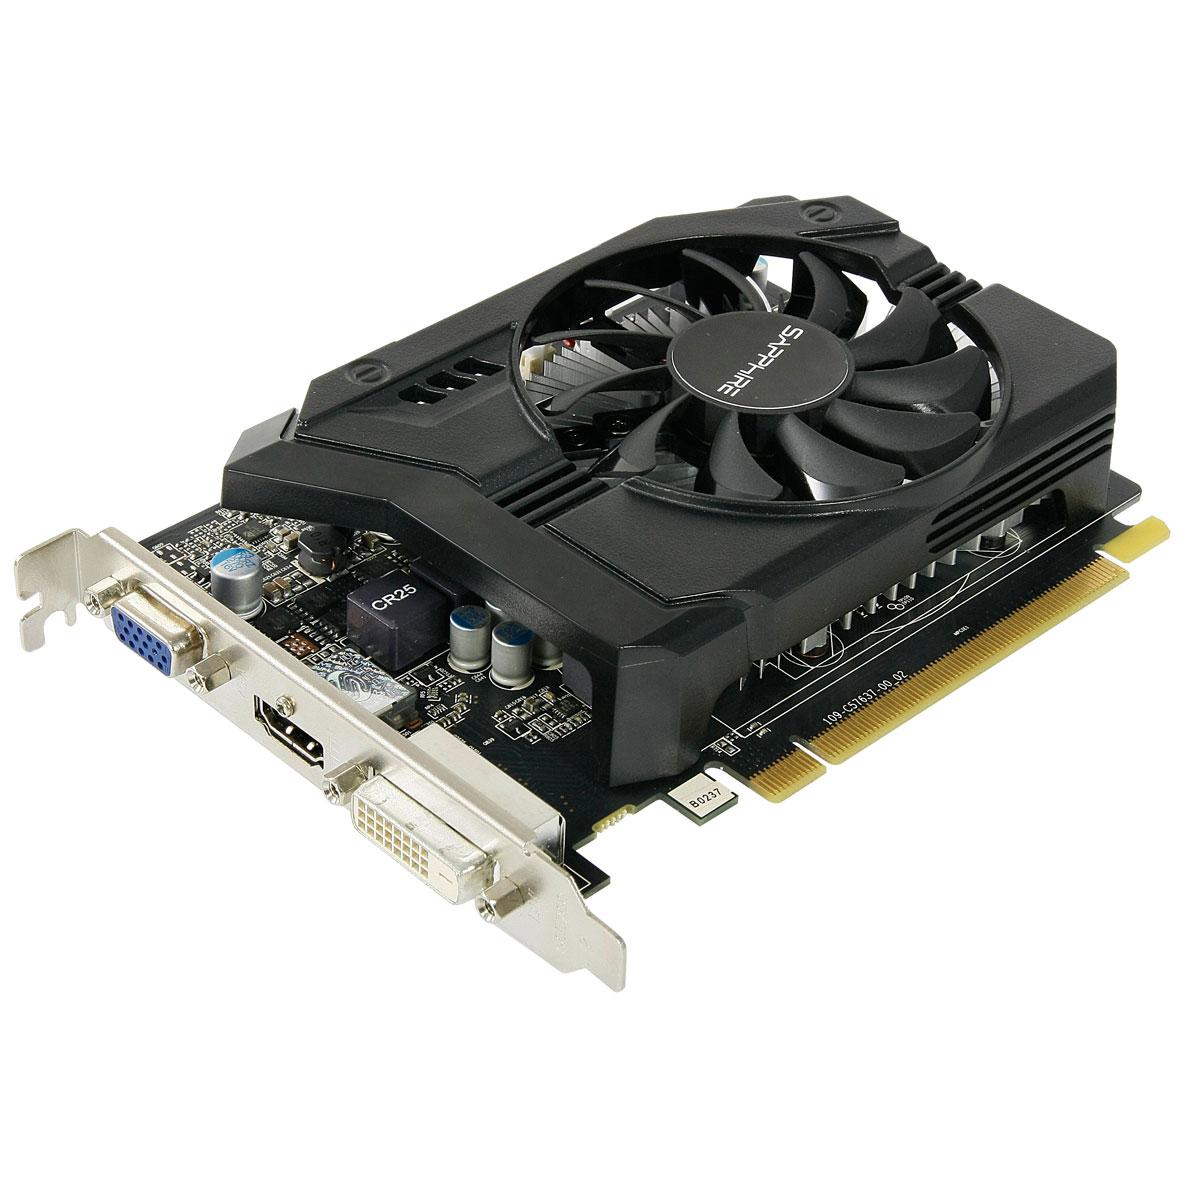 Carte graphique Sapphire Radeon R7 250 1G GDDR5 1 Go HDMI/DVI - PCI Express (AMD Radeon R7 250)